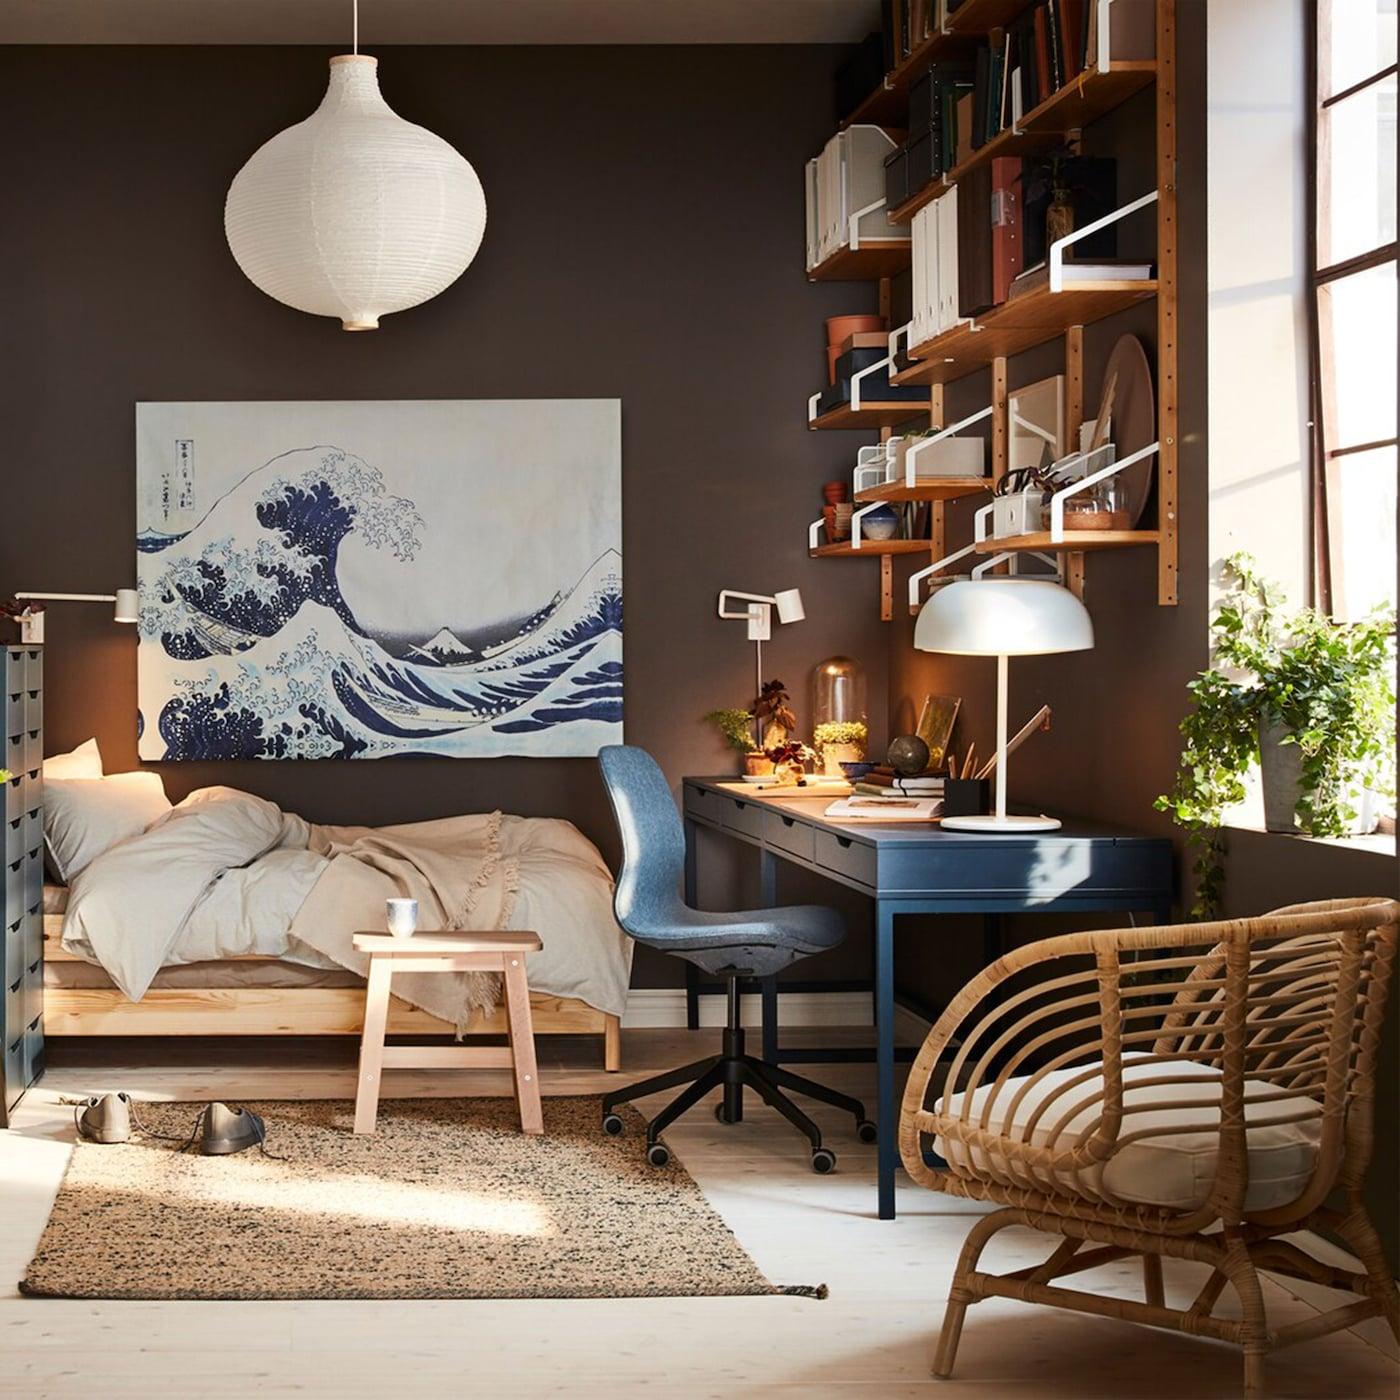 Home Office Ideas - Home Office Inspiration - IKEA Ireland